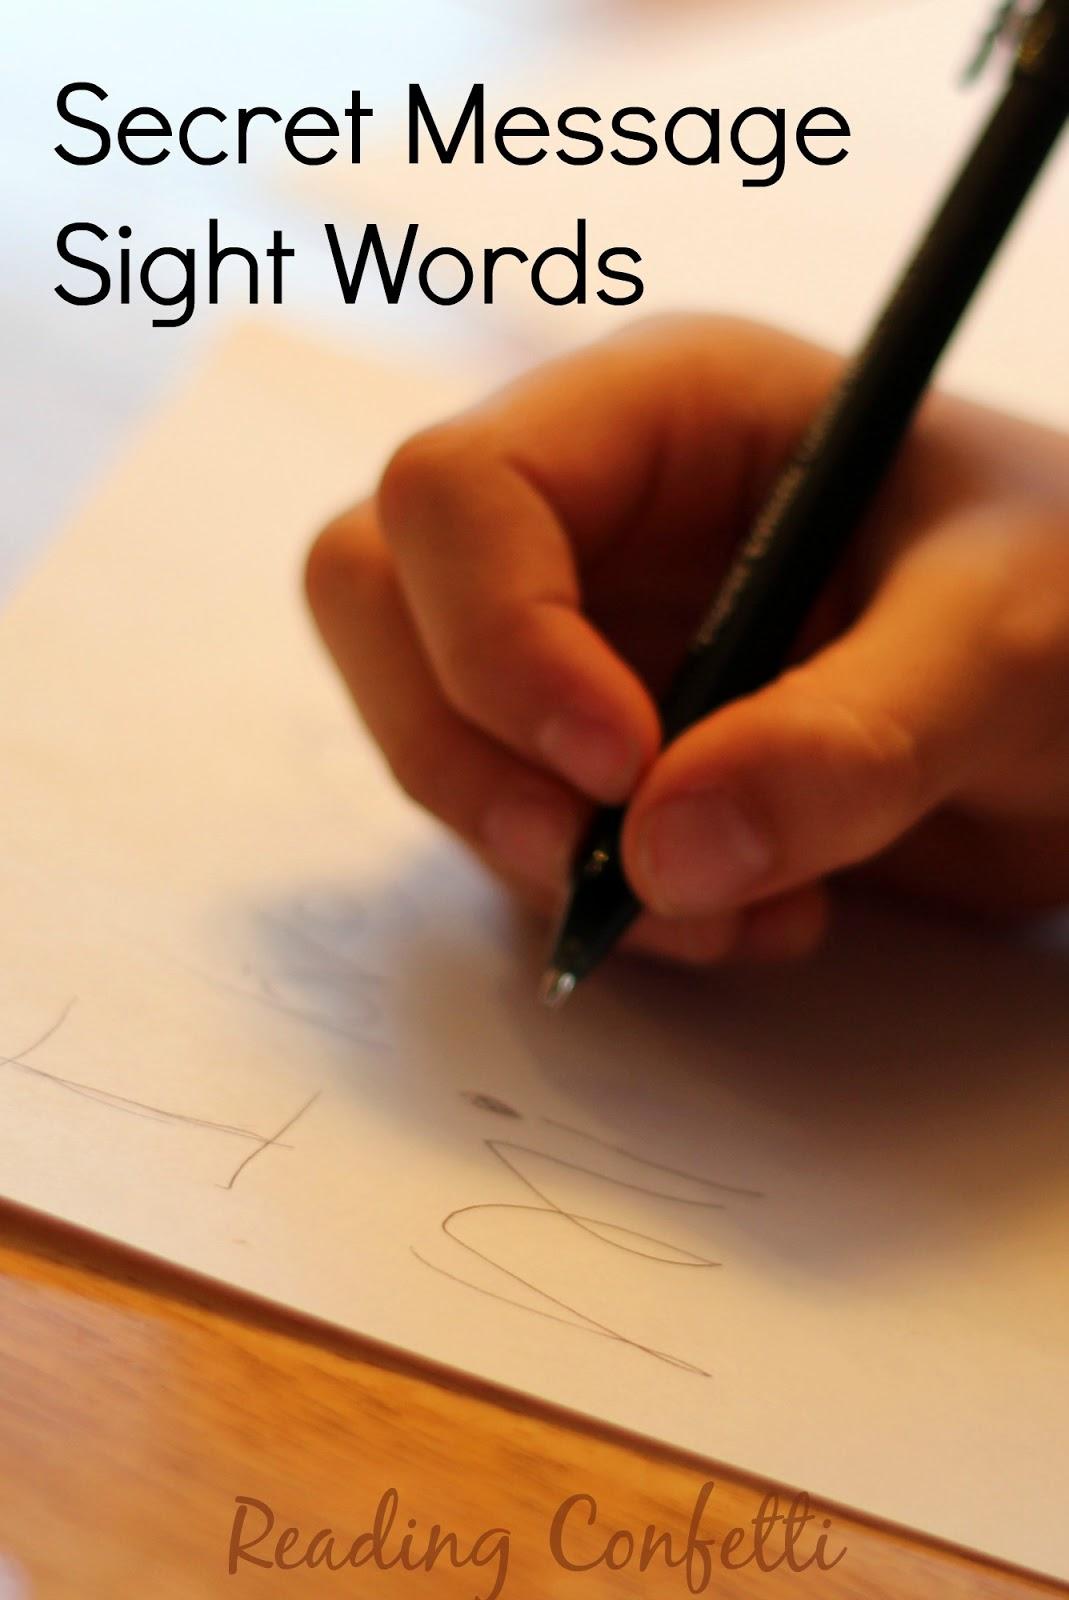 Secret Message Sight Words Reading Confetti